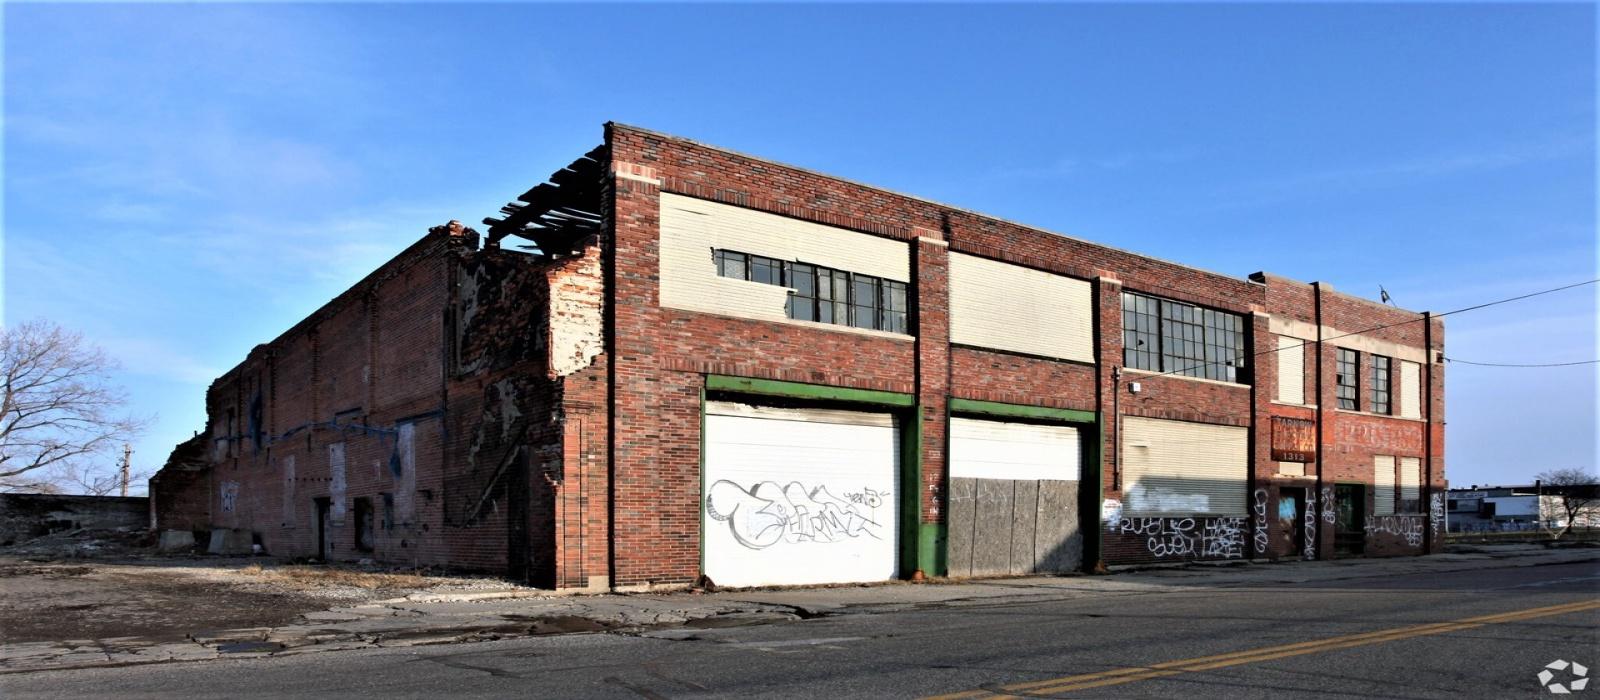 1313 Milwaukee St, Detroit, Michigan 48211, ,Multi-Use,For Sale,1313 Milwaukee St,1023